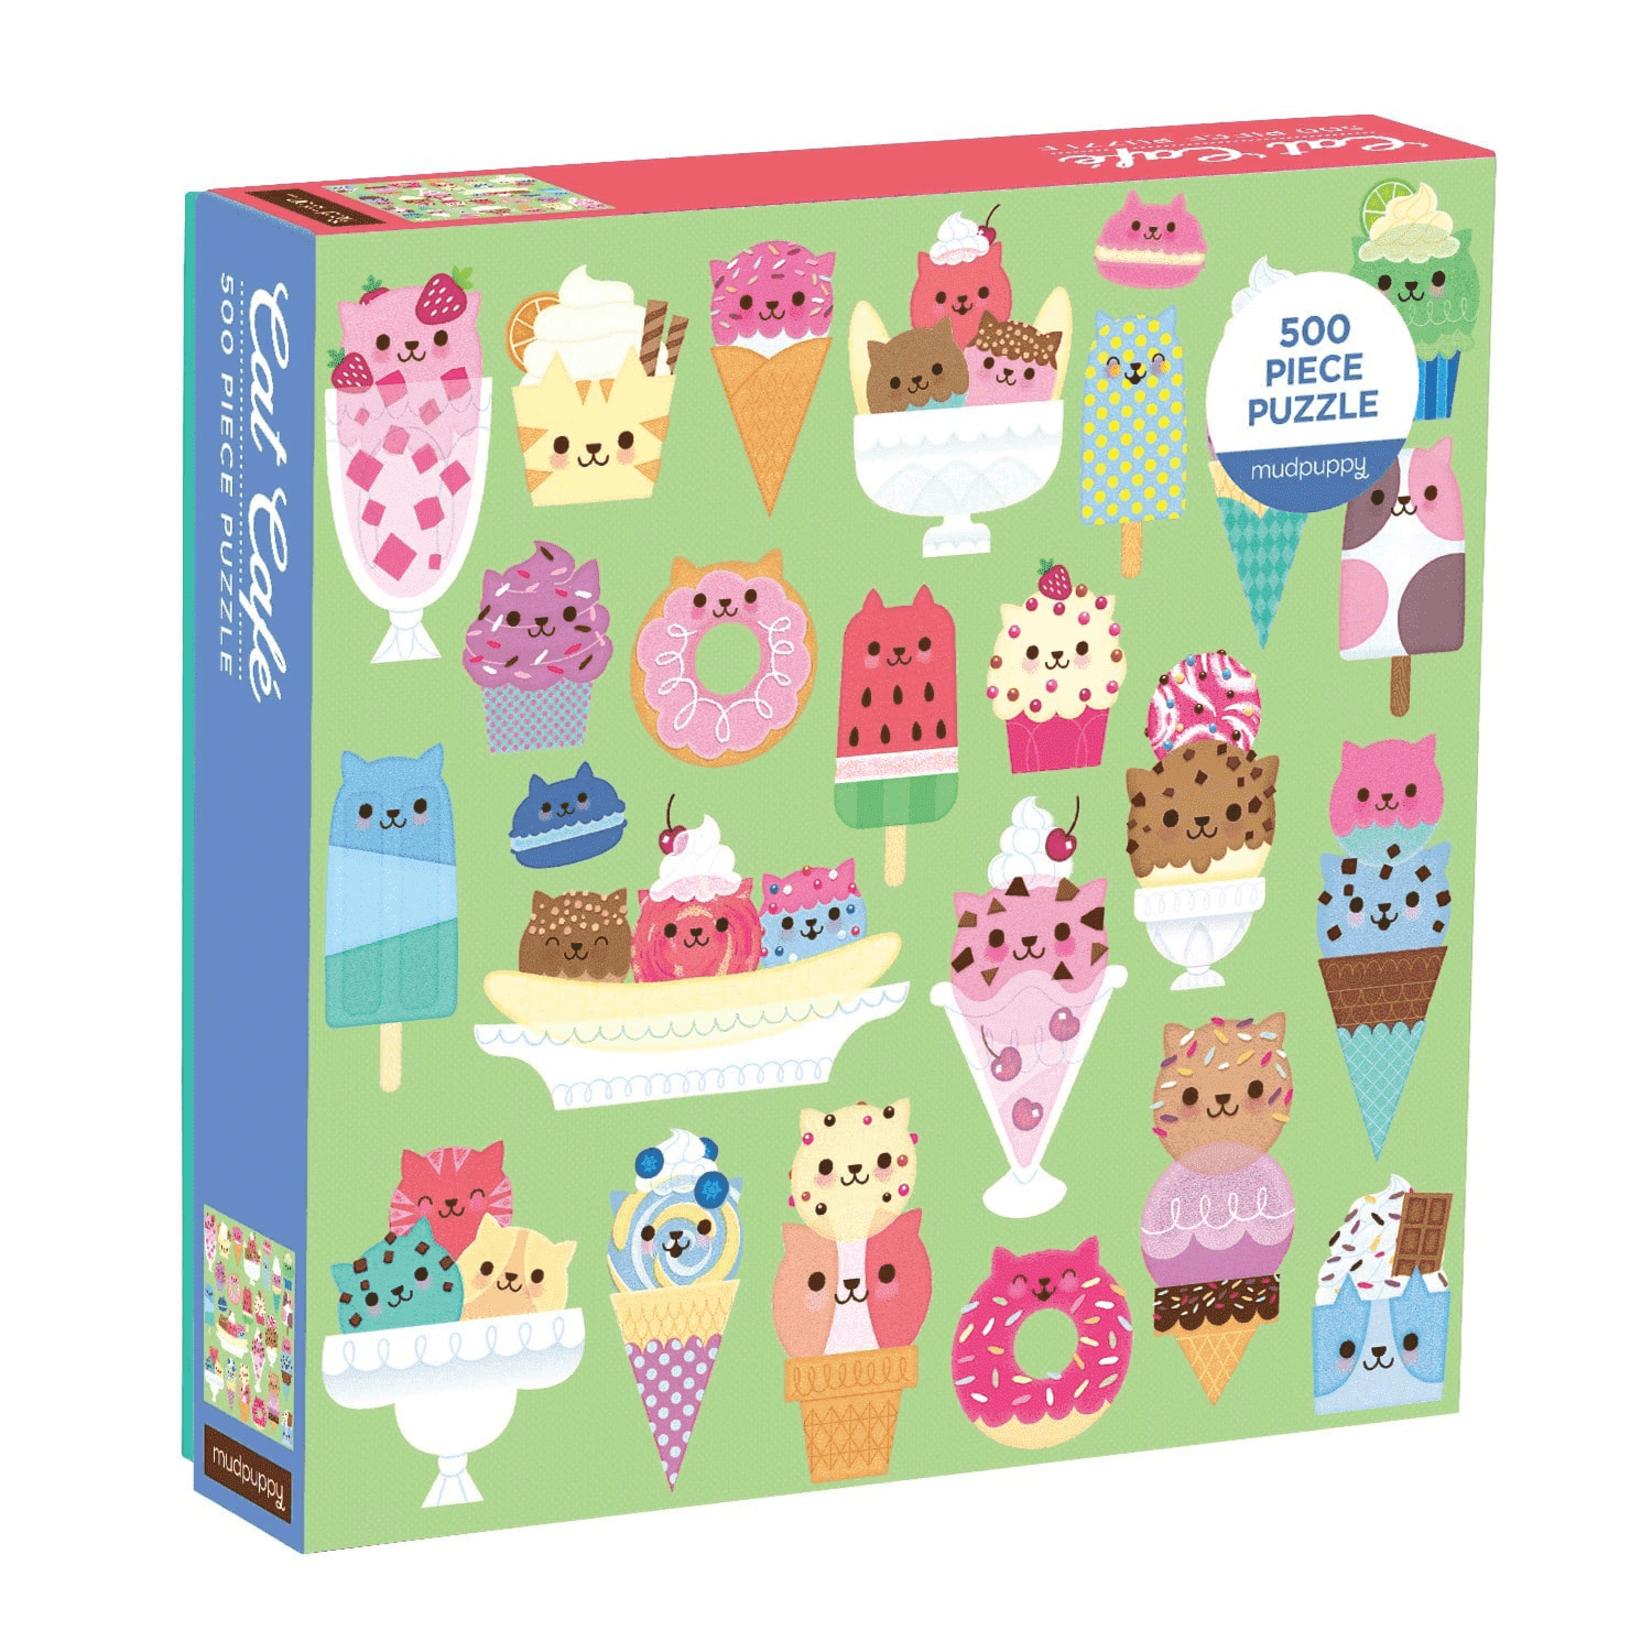 Mudpuppy Mudpuppy - 500 Piece Puzzle: Cat Cafe